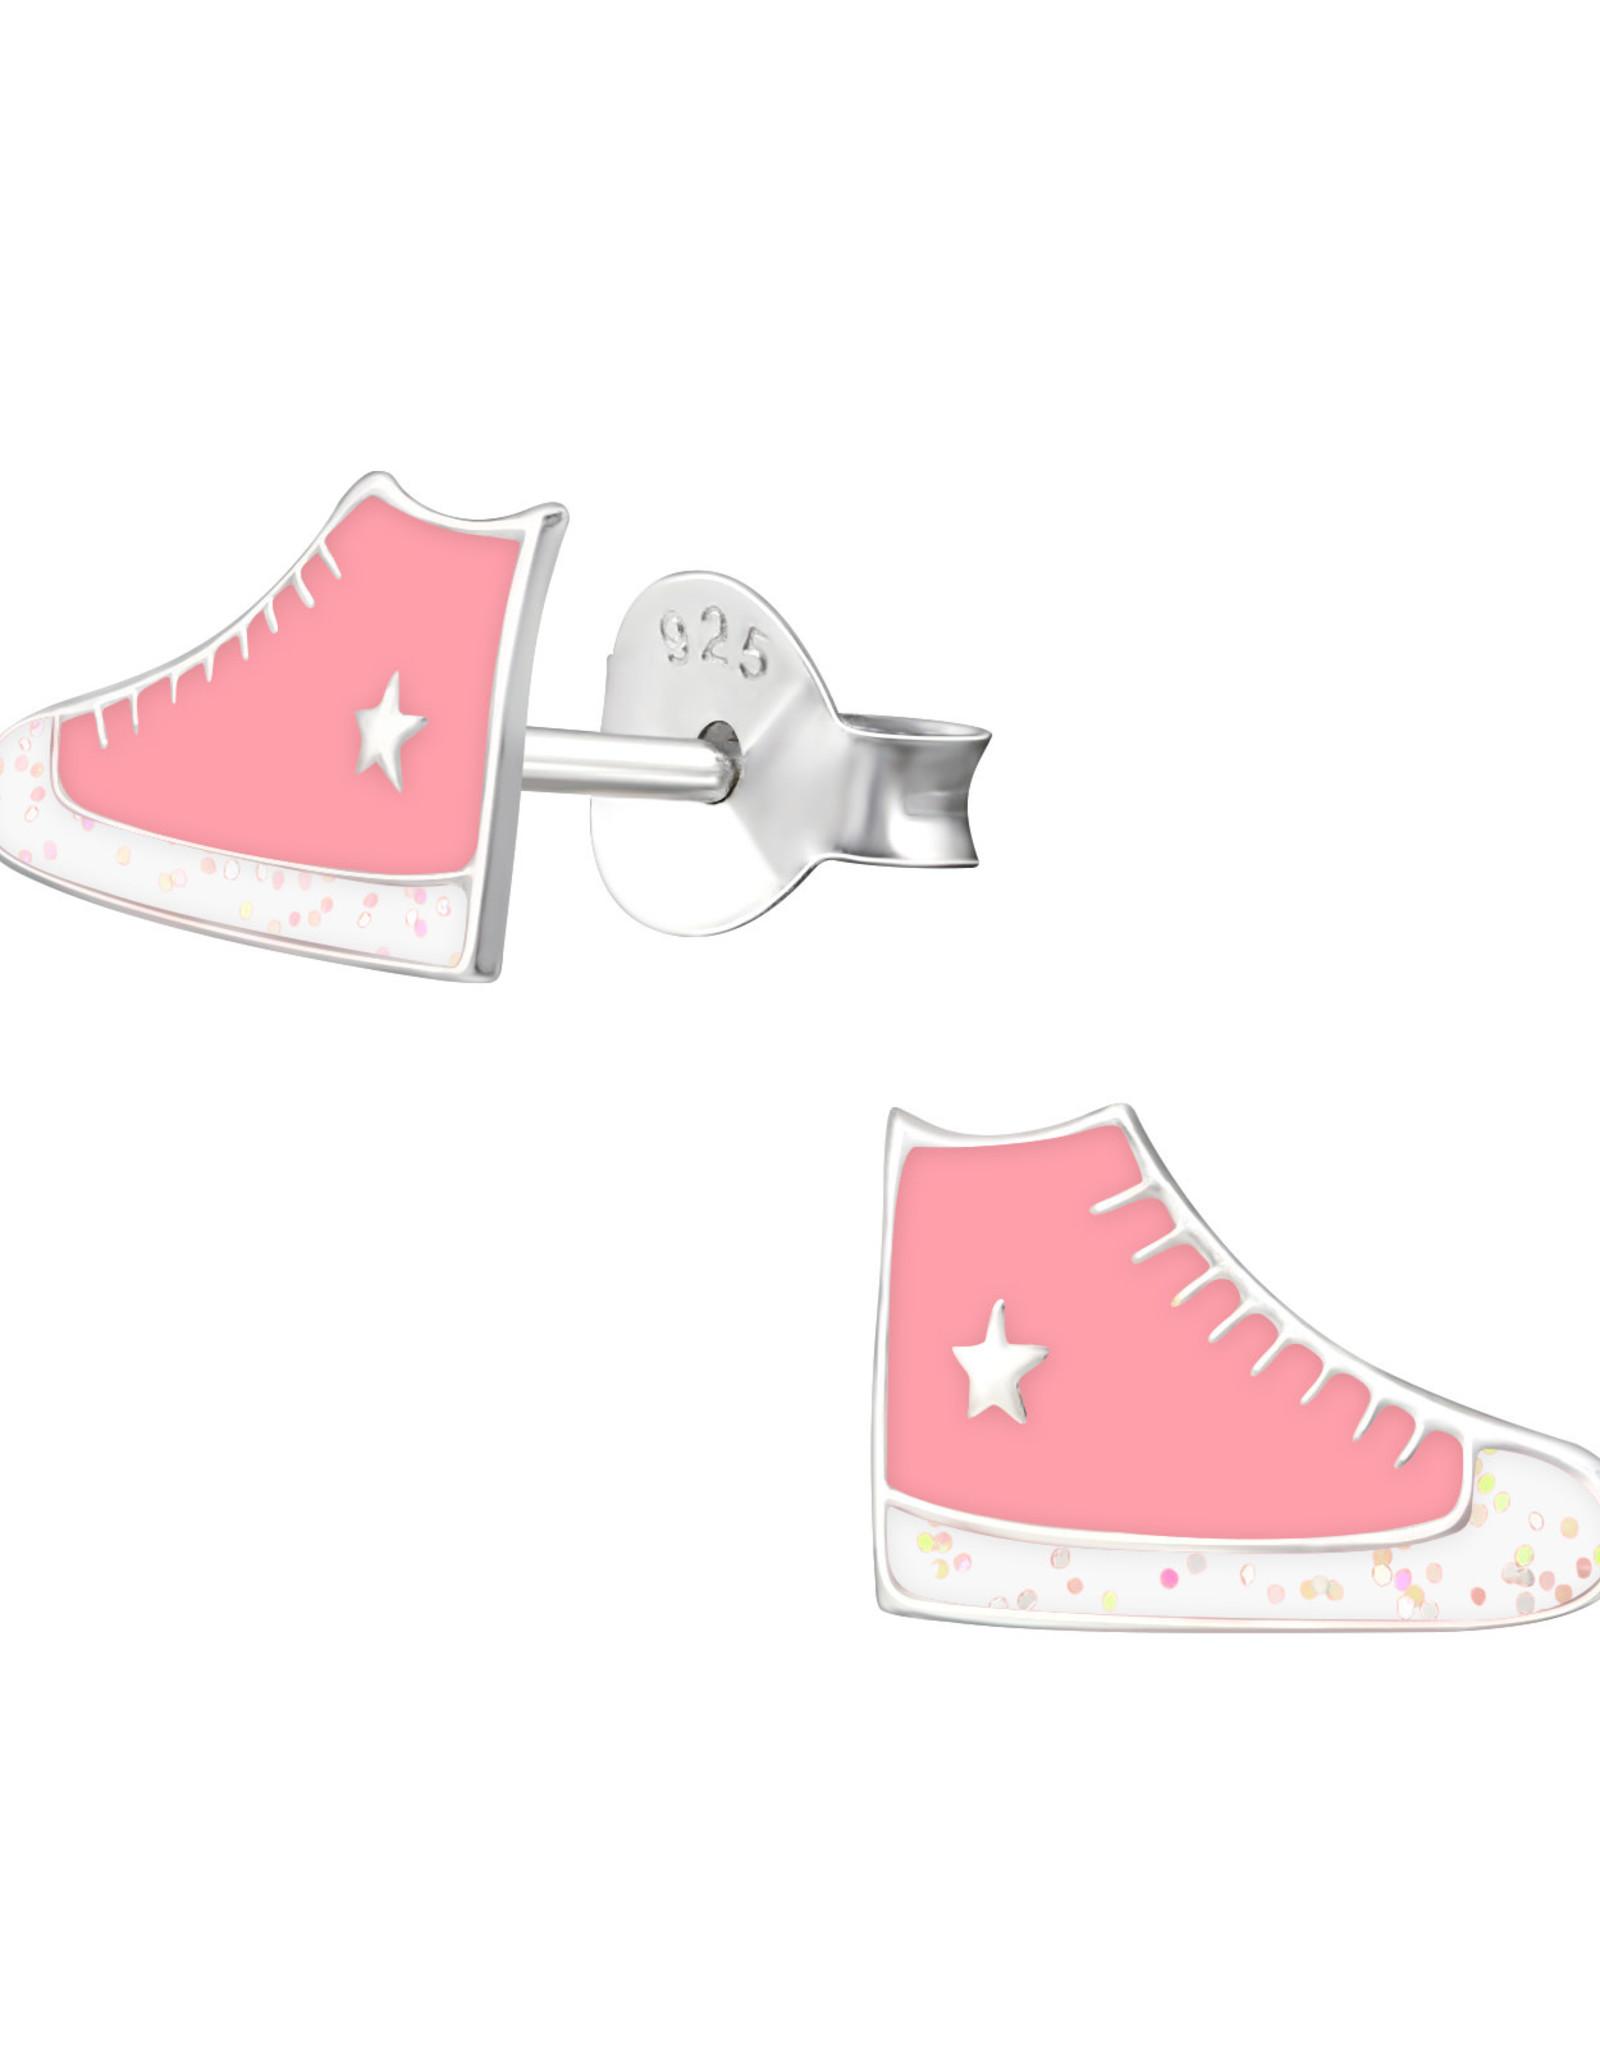 Precious jewels Precious jewels: oorstekers basketschoenen